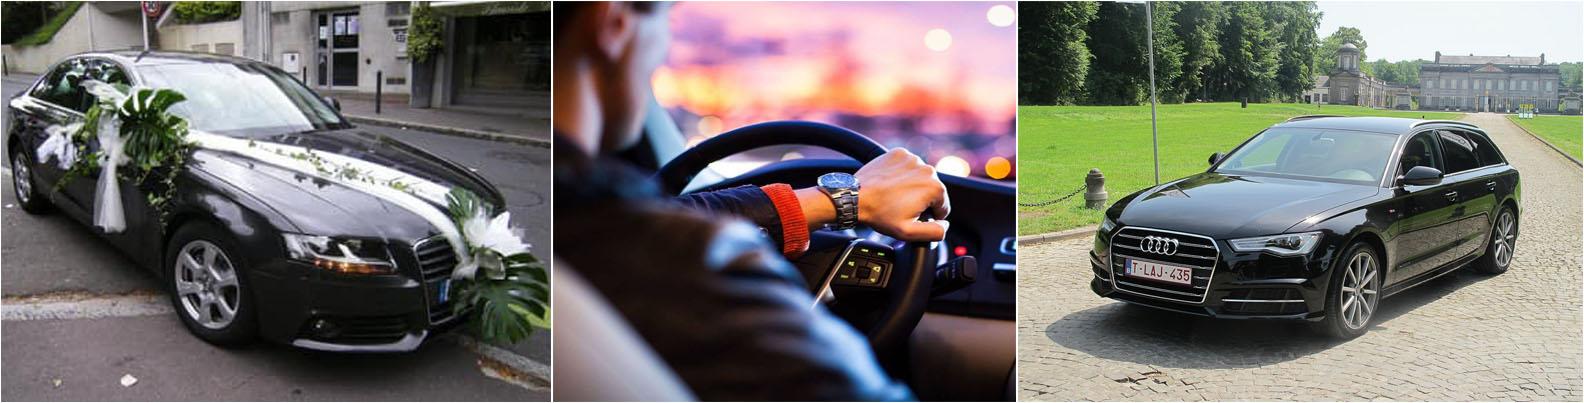 cover-partenaire-location-vehicules-elite-security-driver